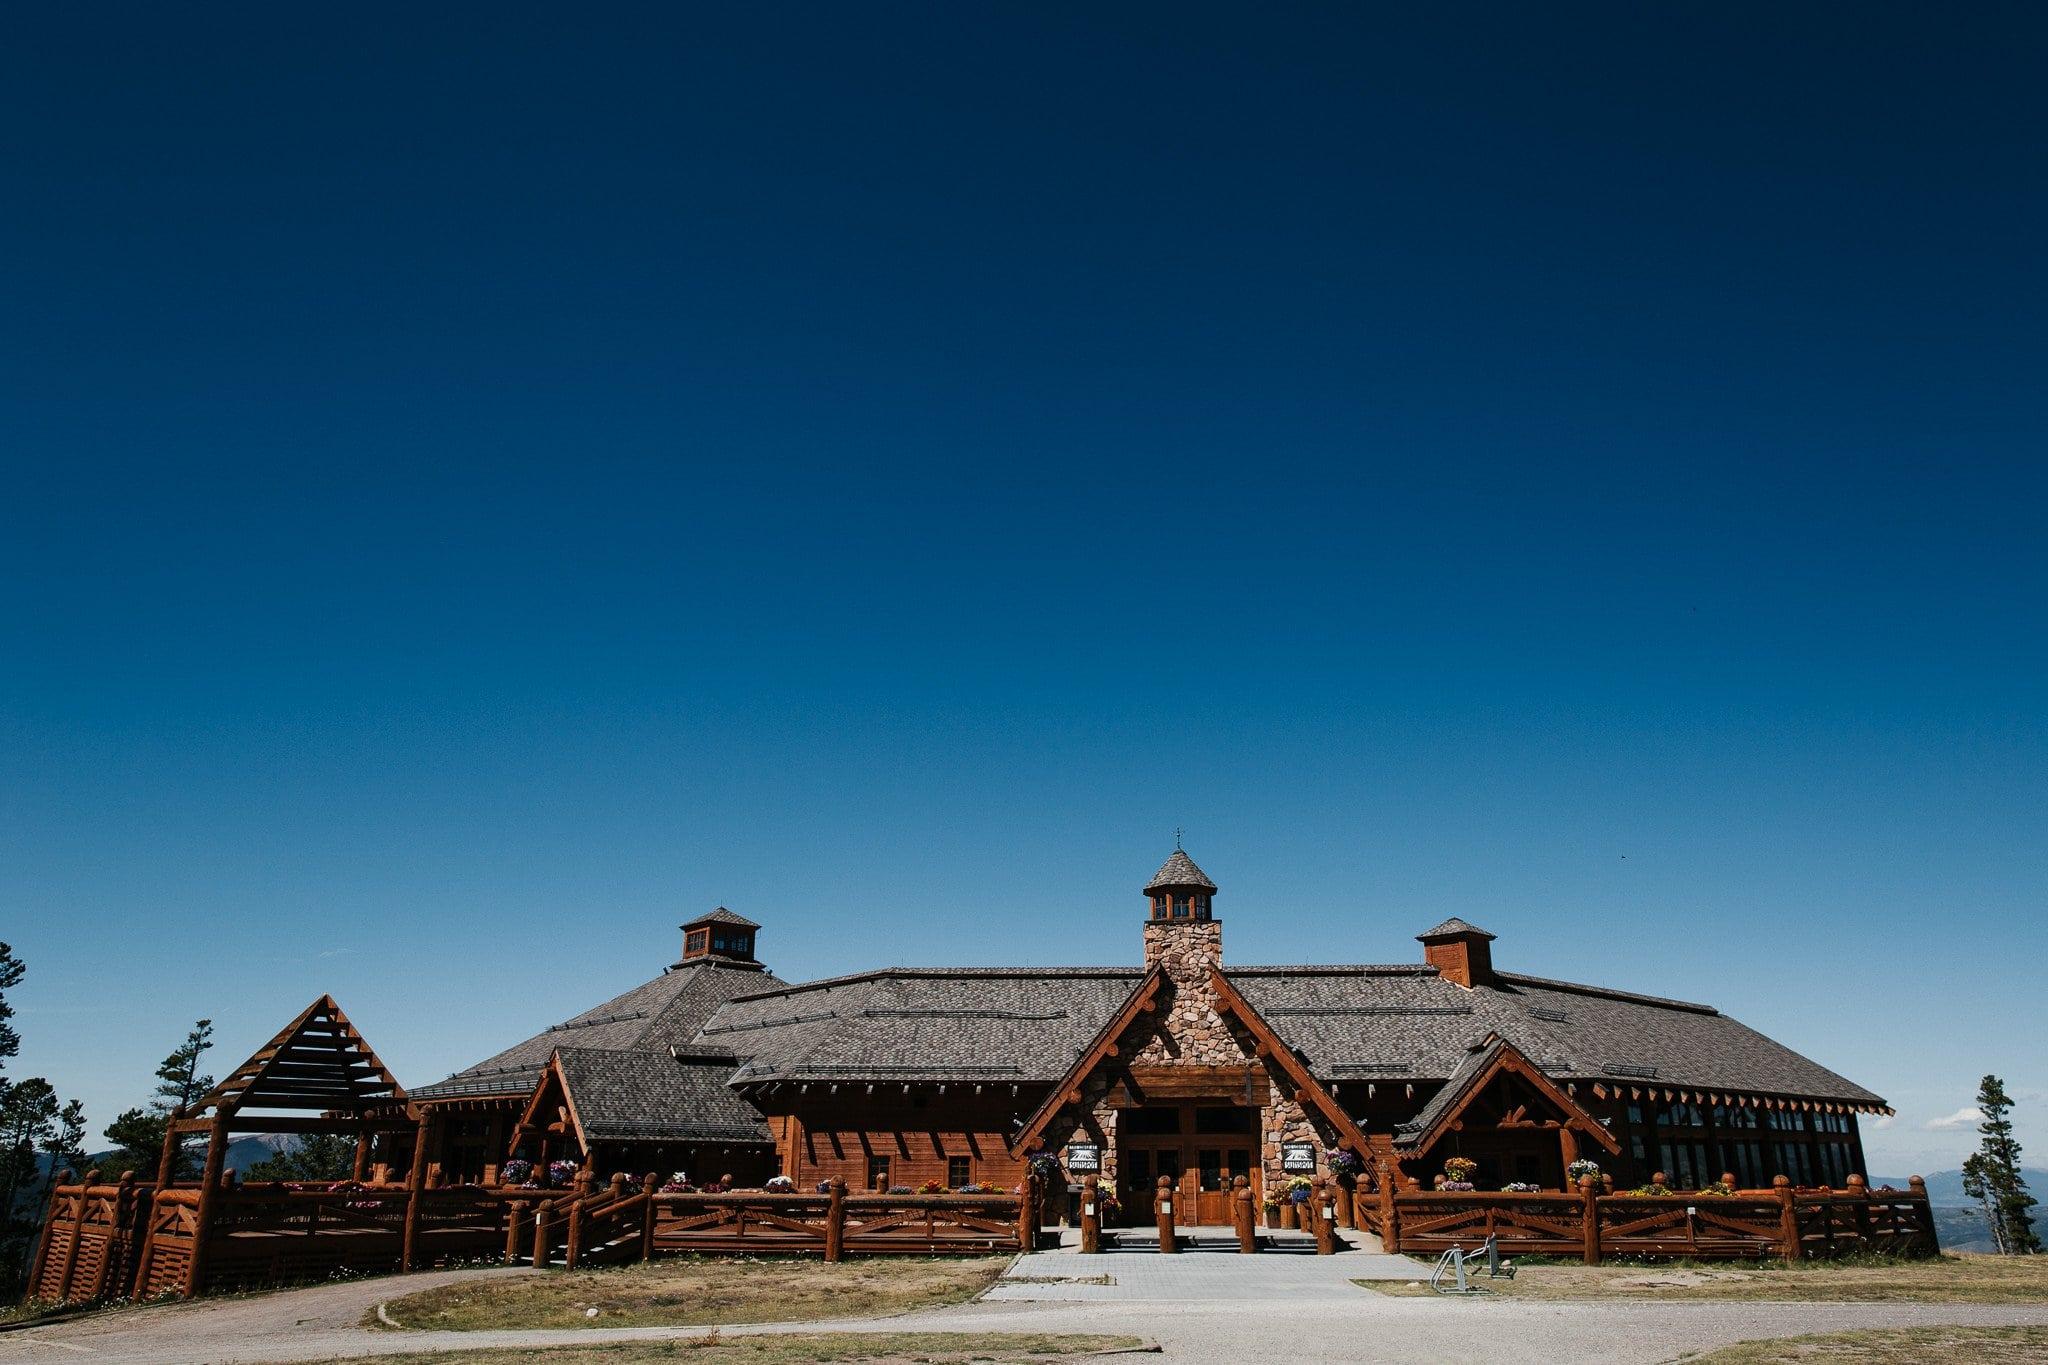 Sunspot Lodge at Winter Park Ski Resort wedding venue in Colorado